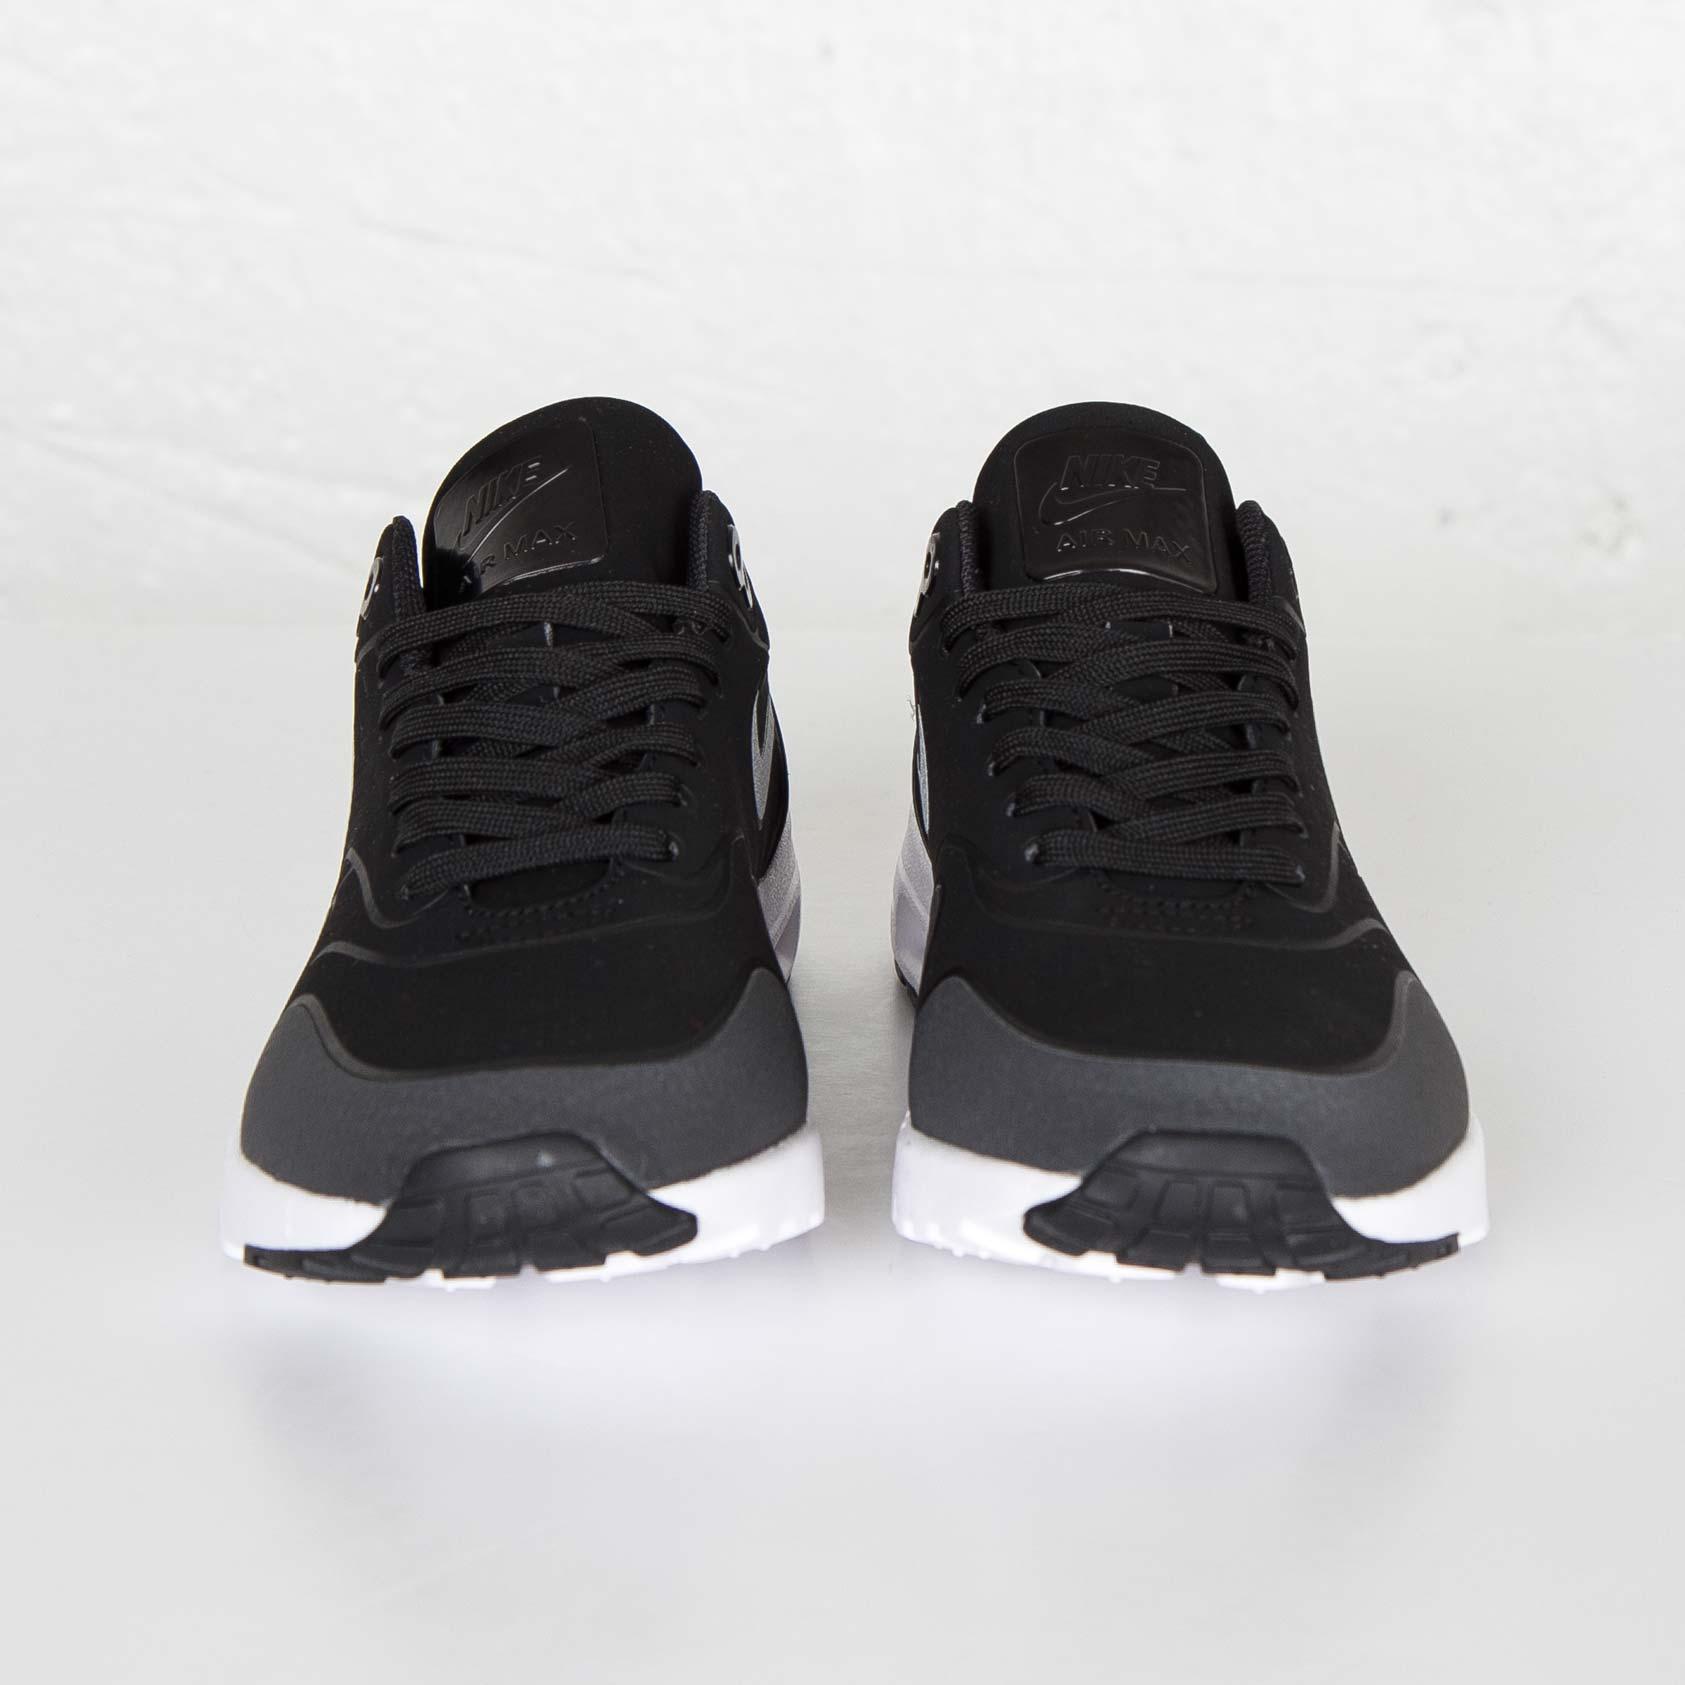 Wmns Air Ultra Moire Nike 704995 Max 1 001 bf6g7Yy